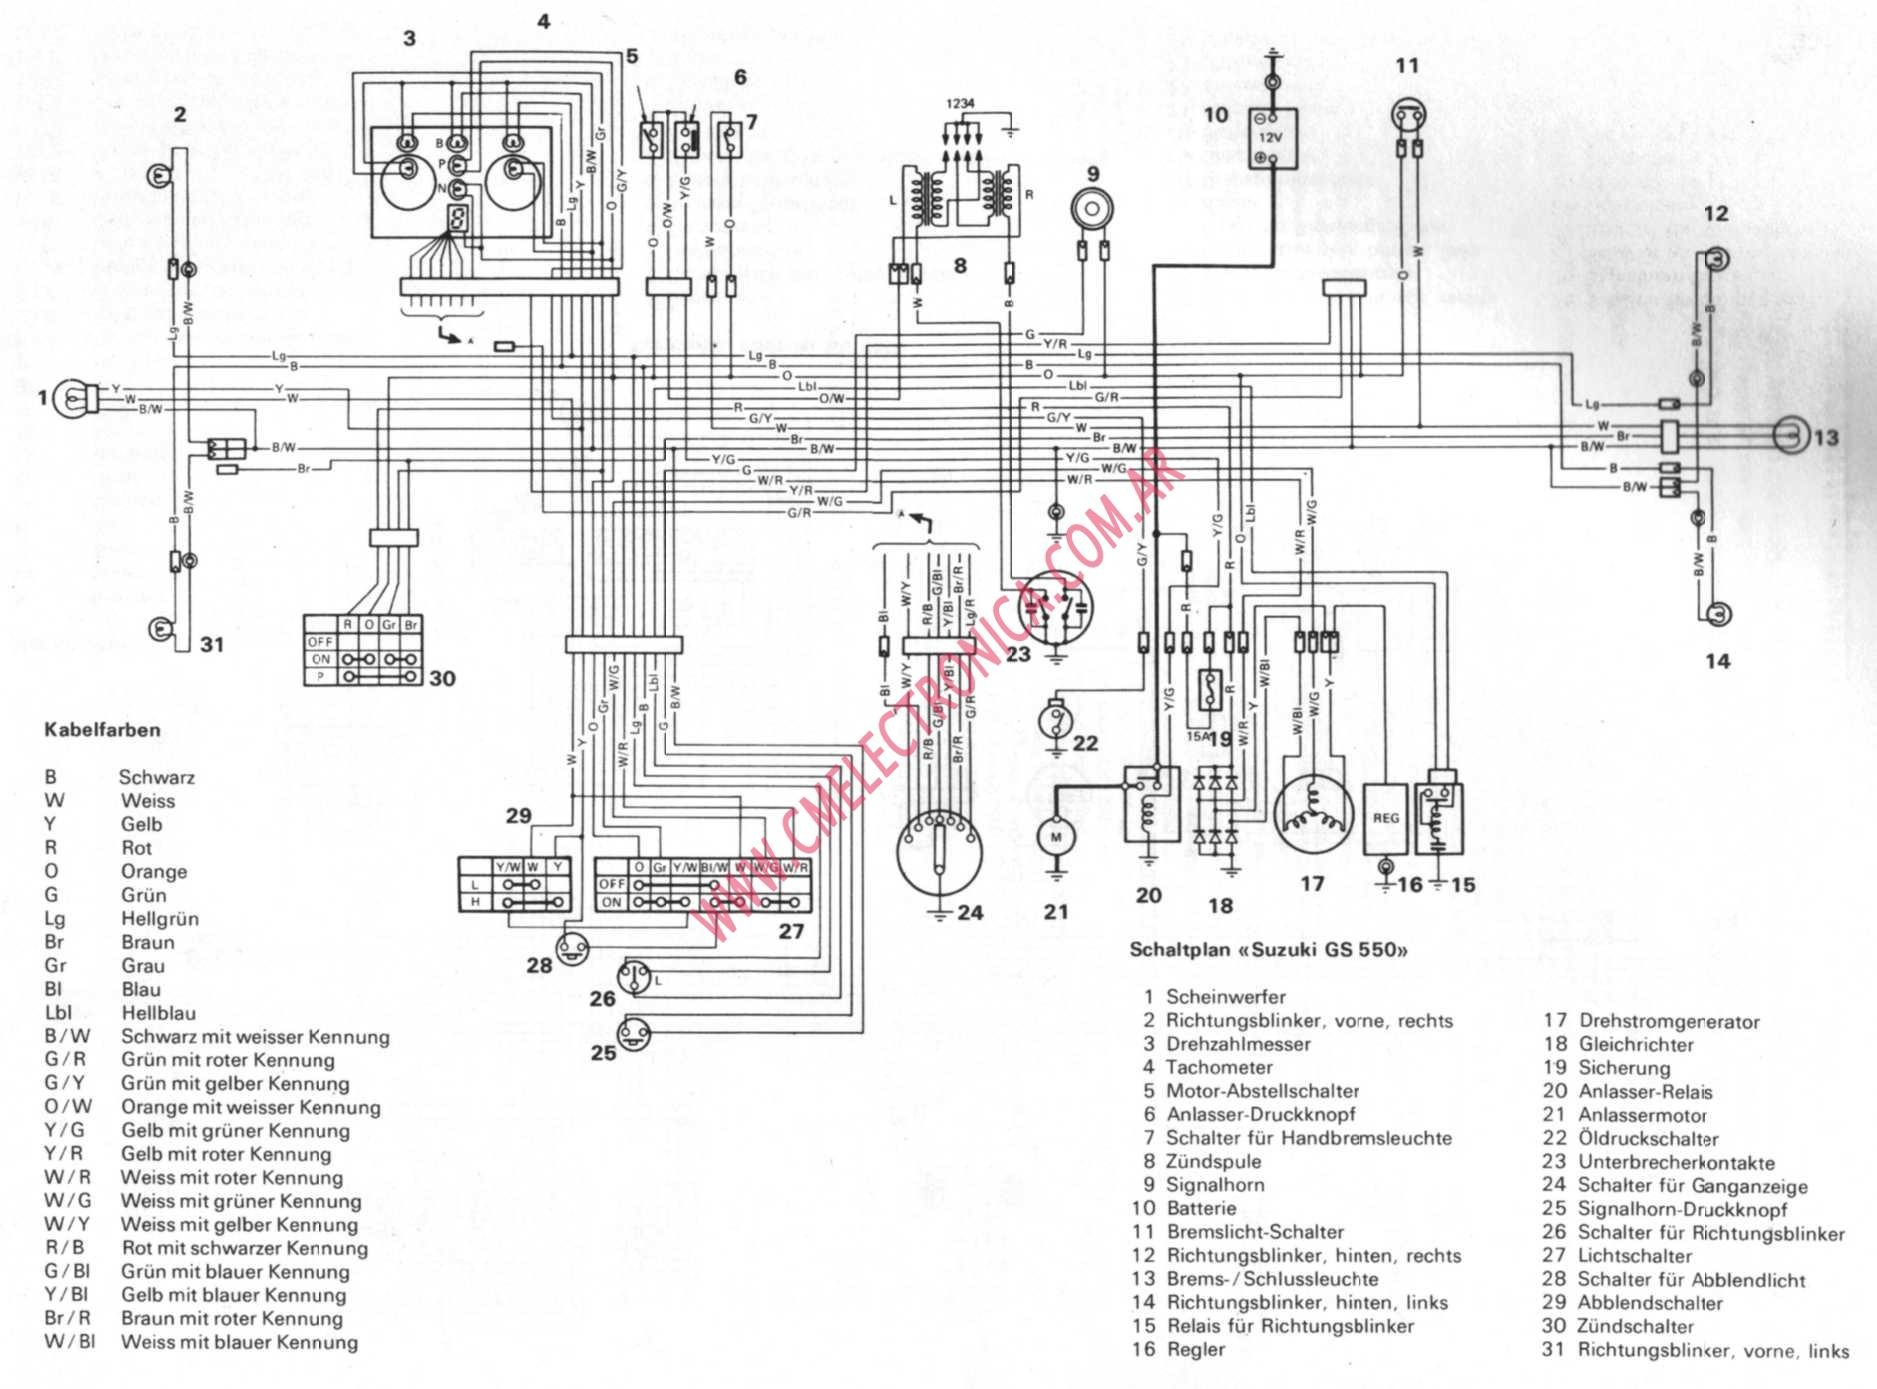 2002 Honda Wiring Scmatic for Scanner 2002 Vt1100 Wiring Diagram Of 2002 Honda Wiring Scmatic for Scanner